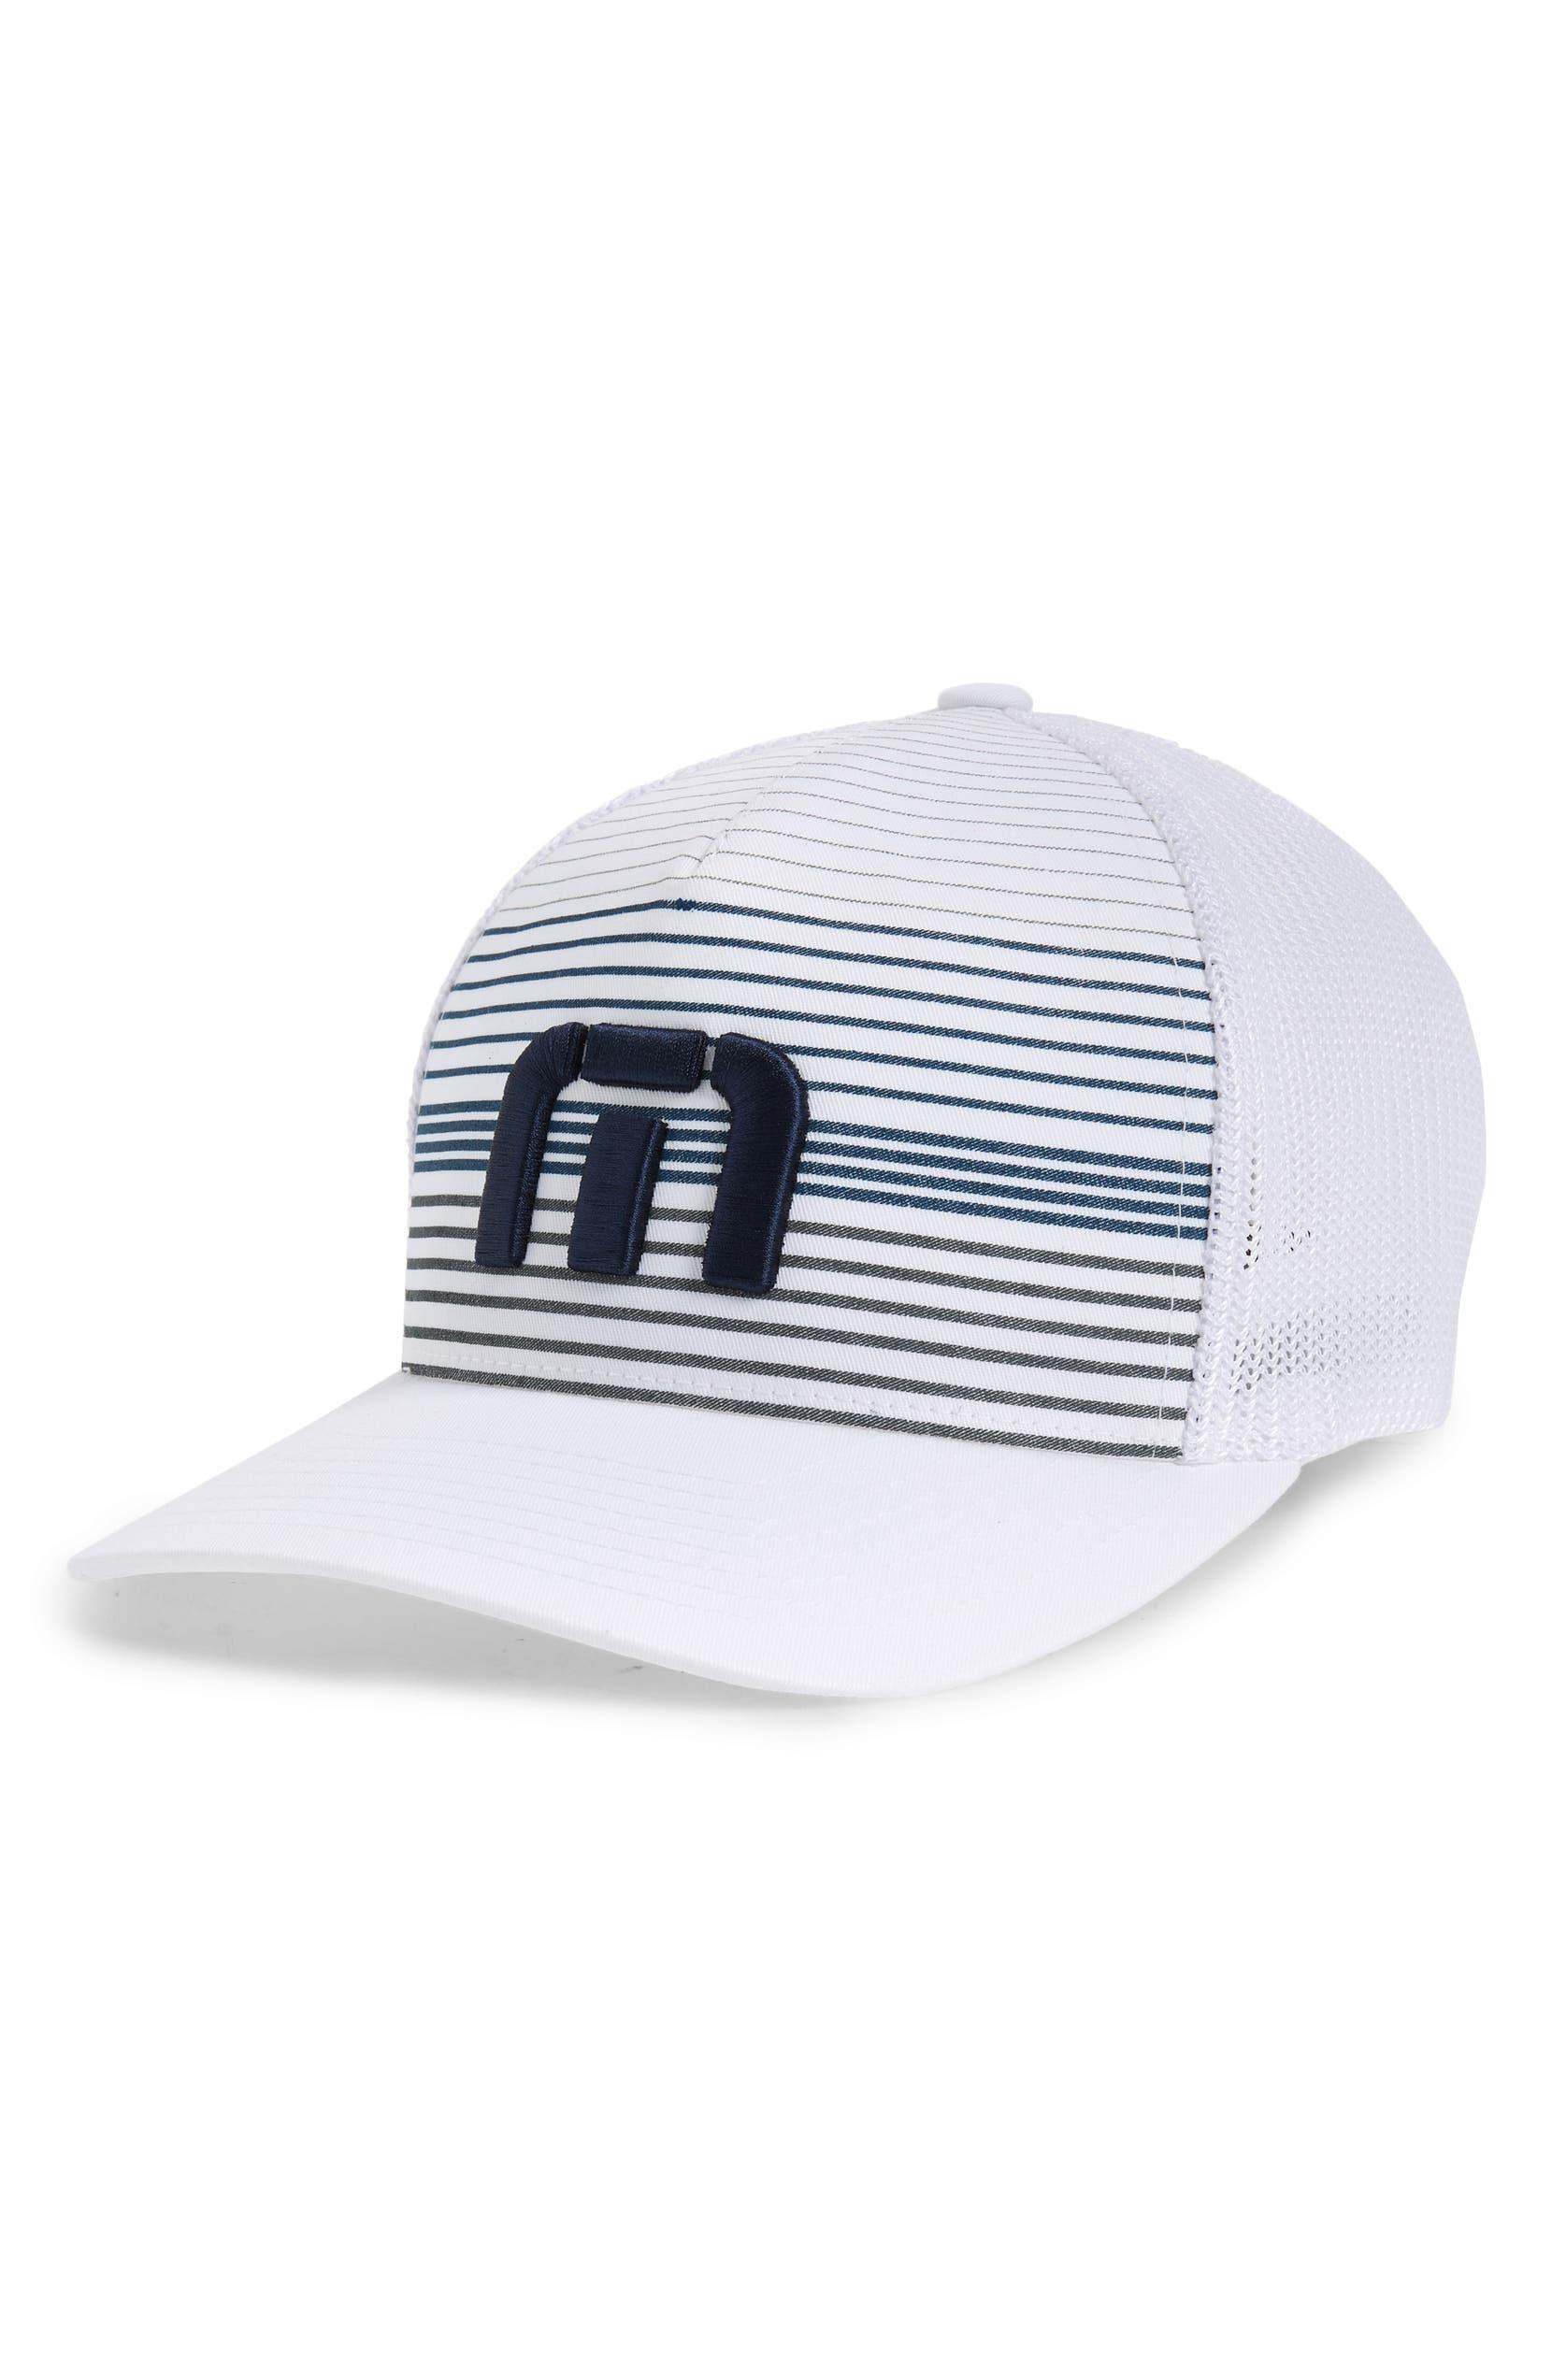 c682f6066d3 Travis Mathew The Executive Trucker Hat